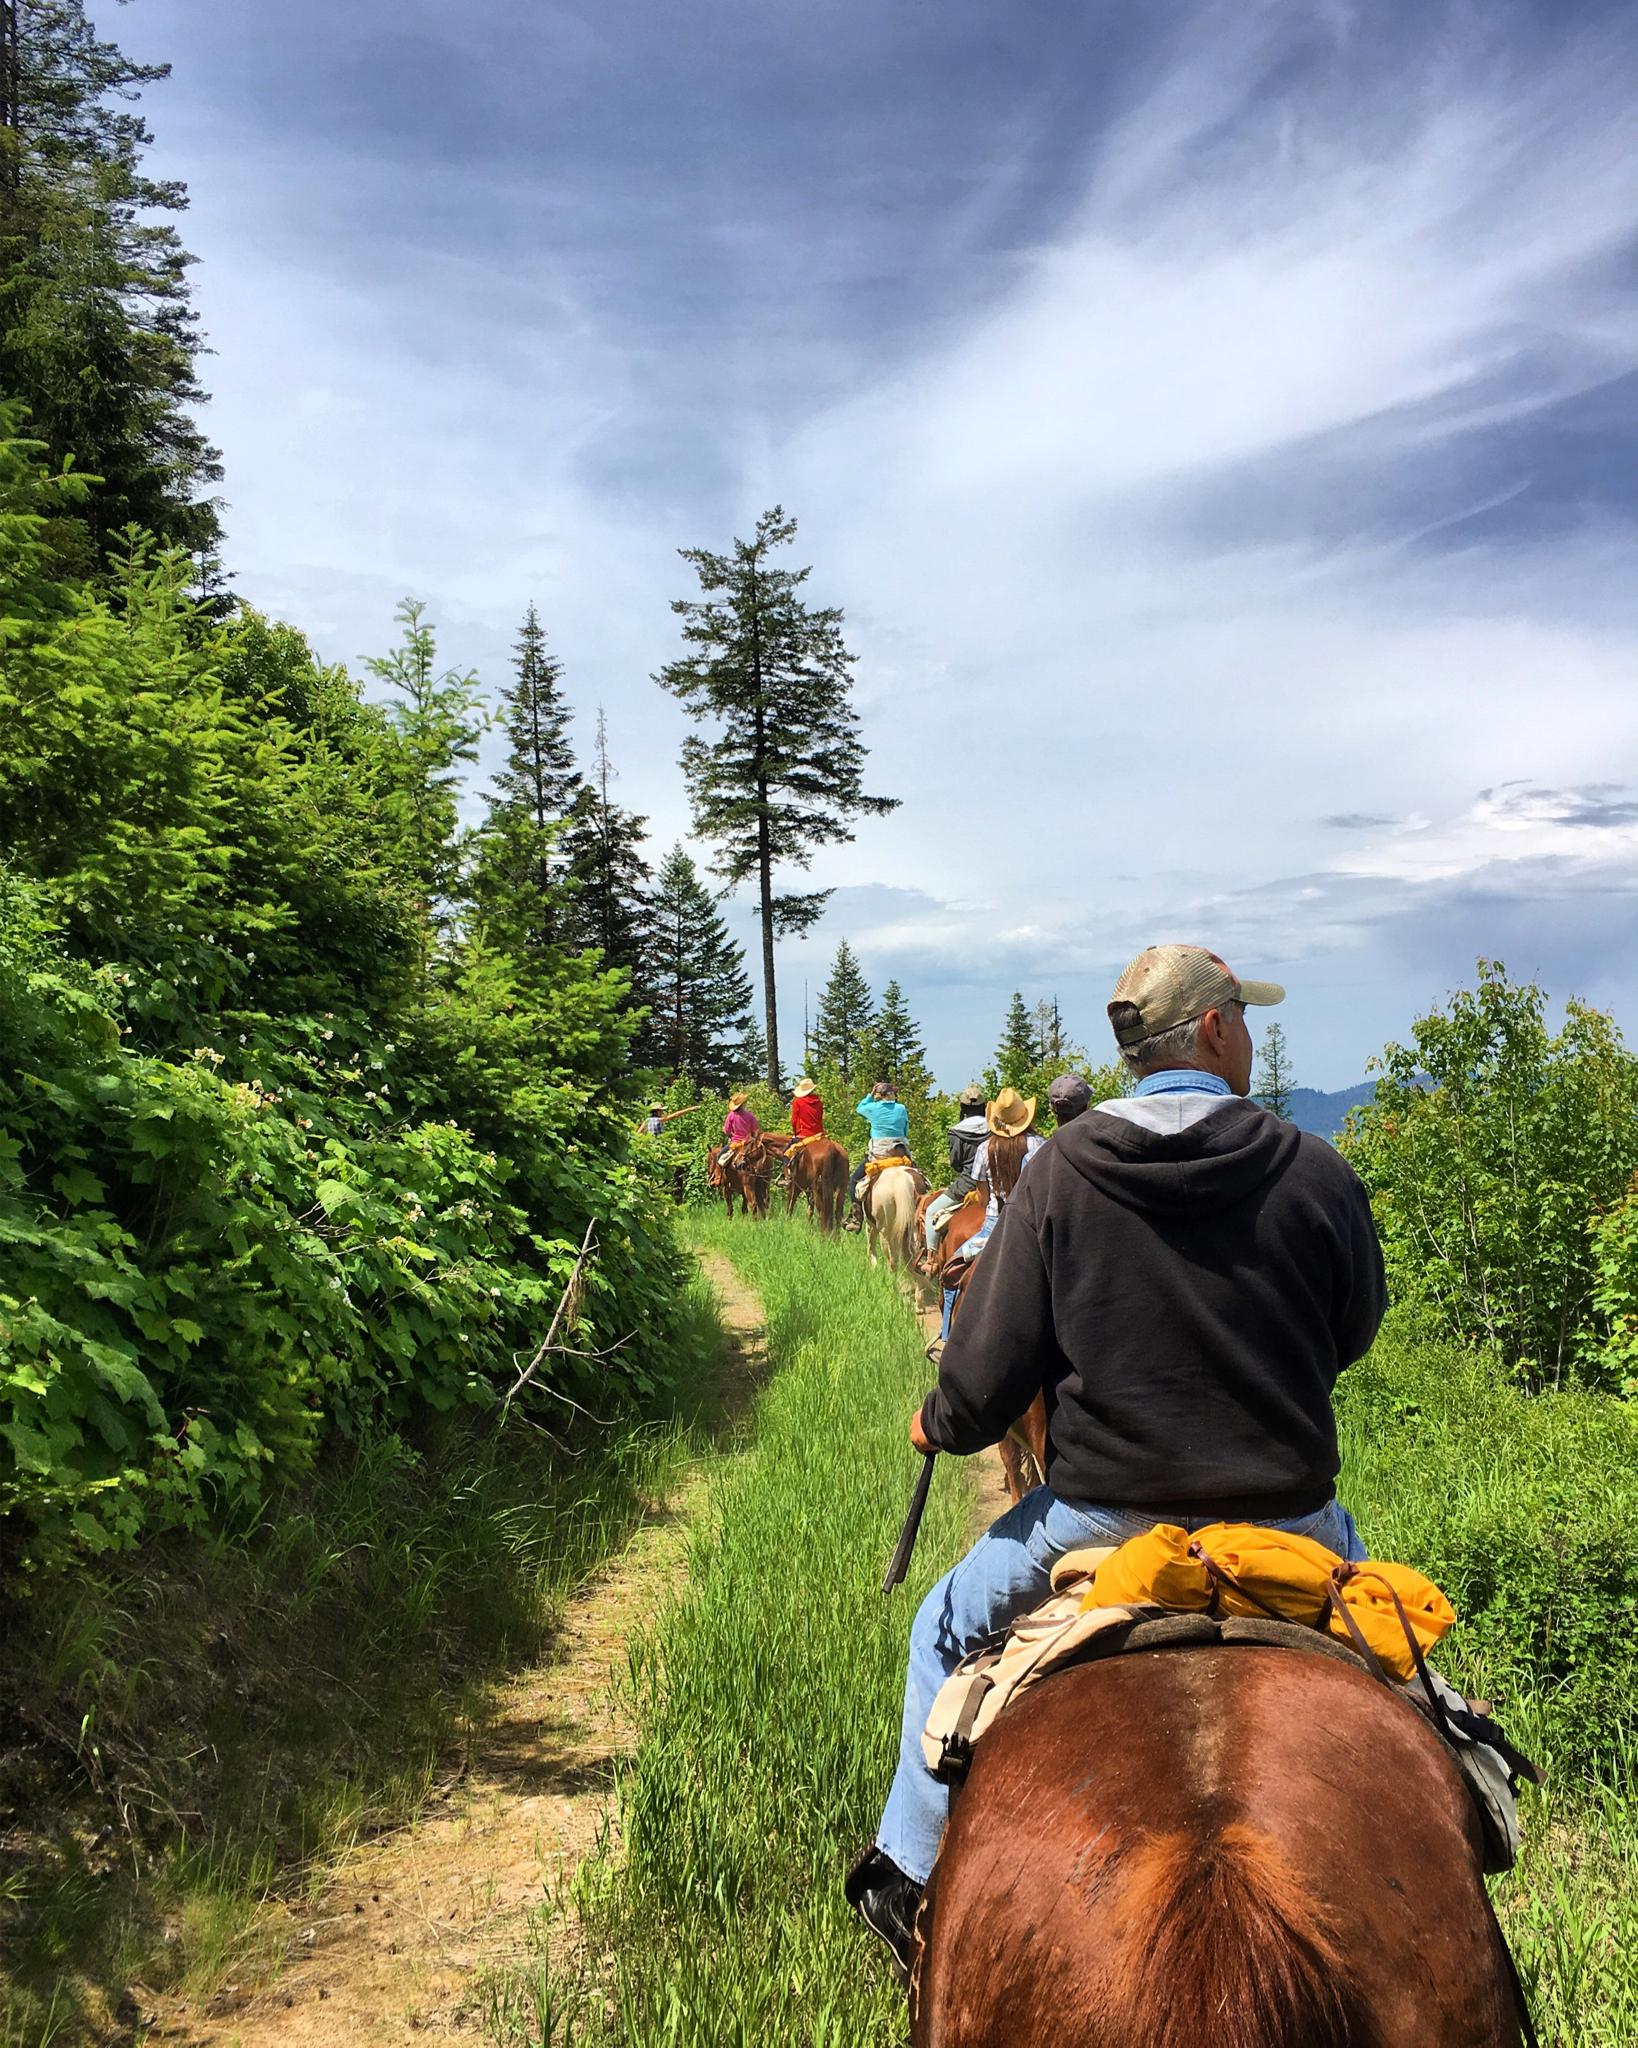 Group on horseback trail ride.